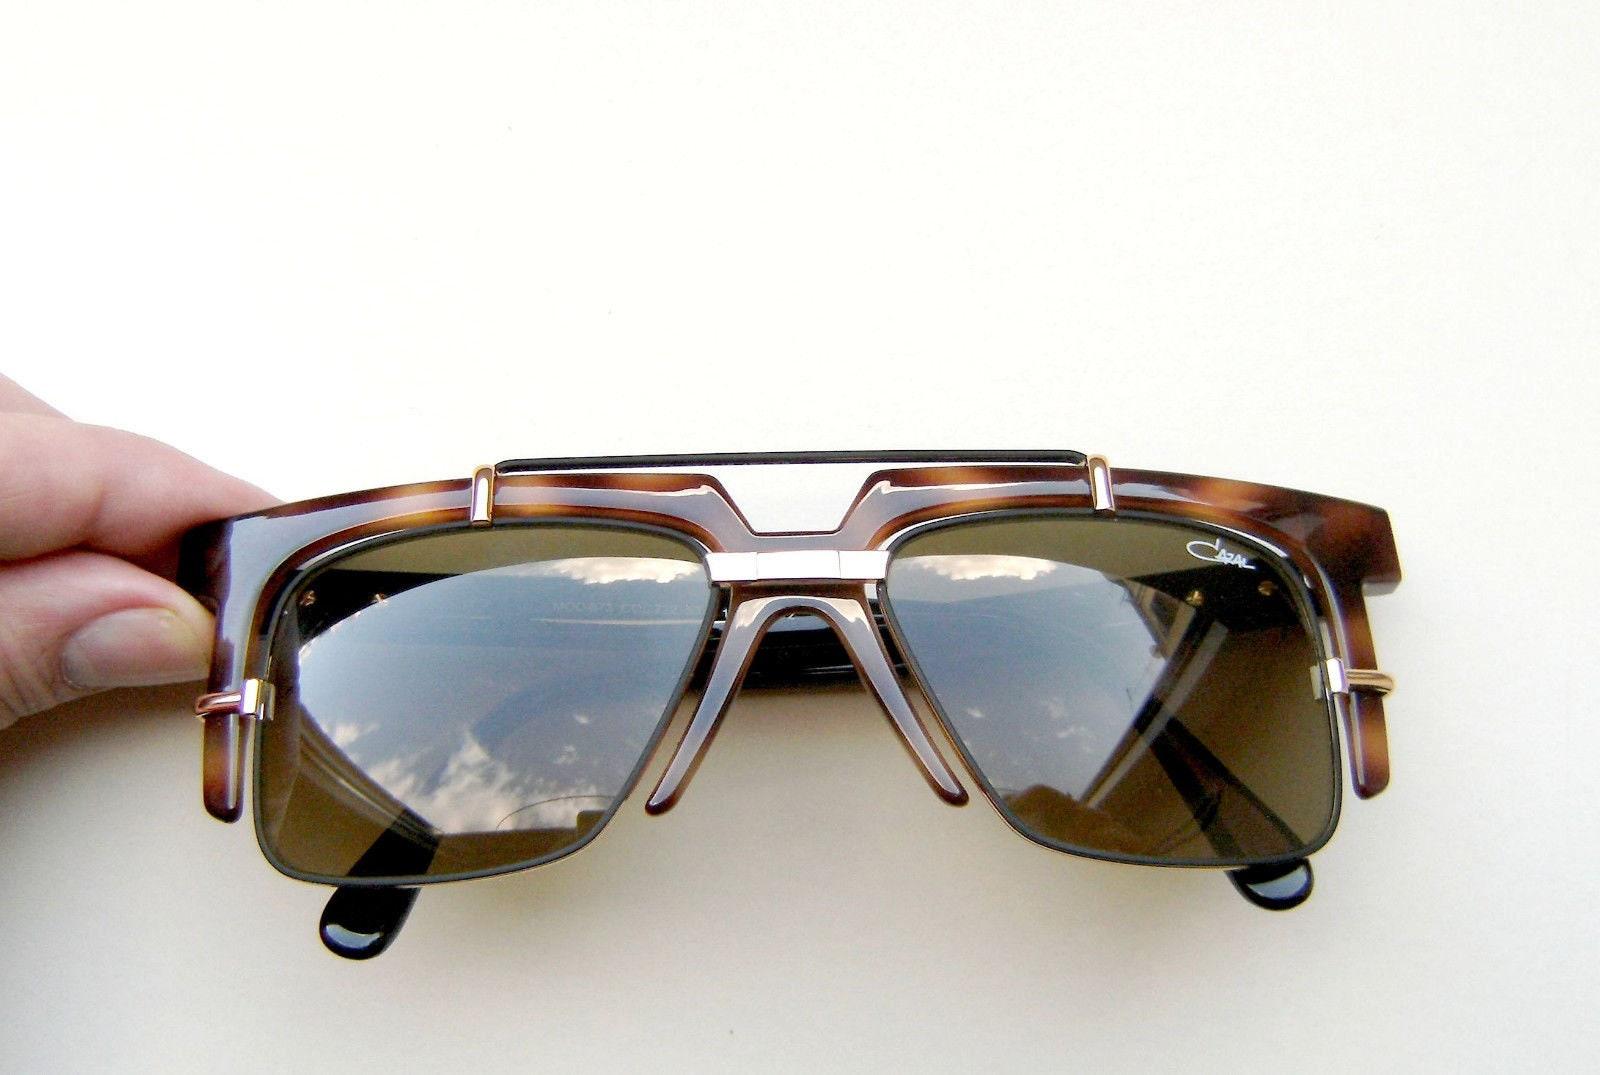 1020ed088ed New Men Sunglasses Cazal Mod 873 001 Amber Brown Black Size